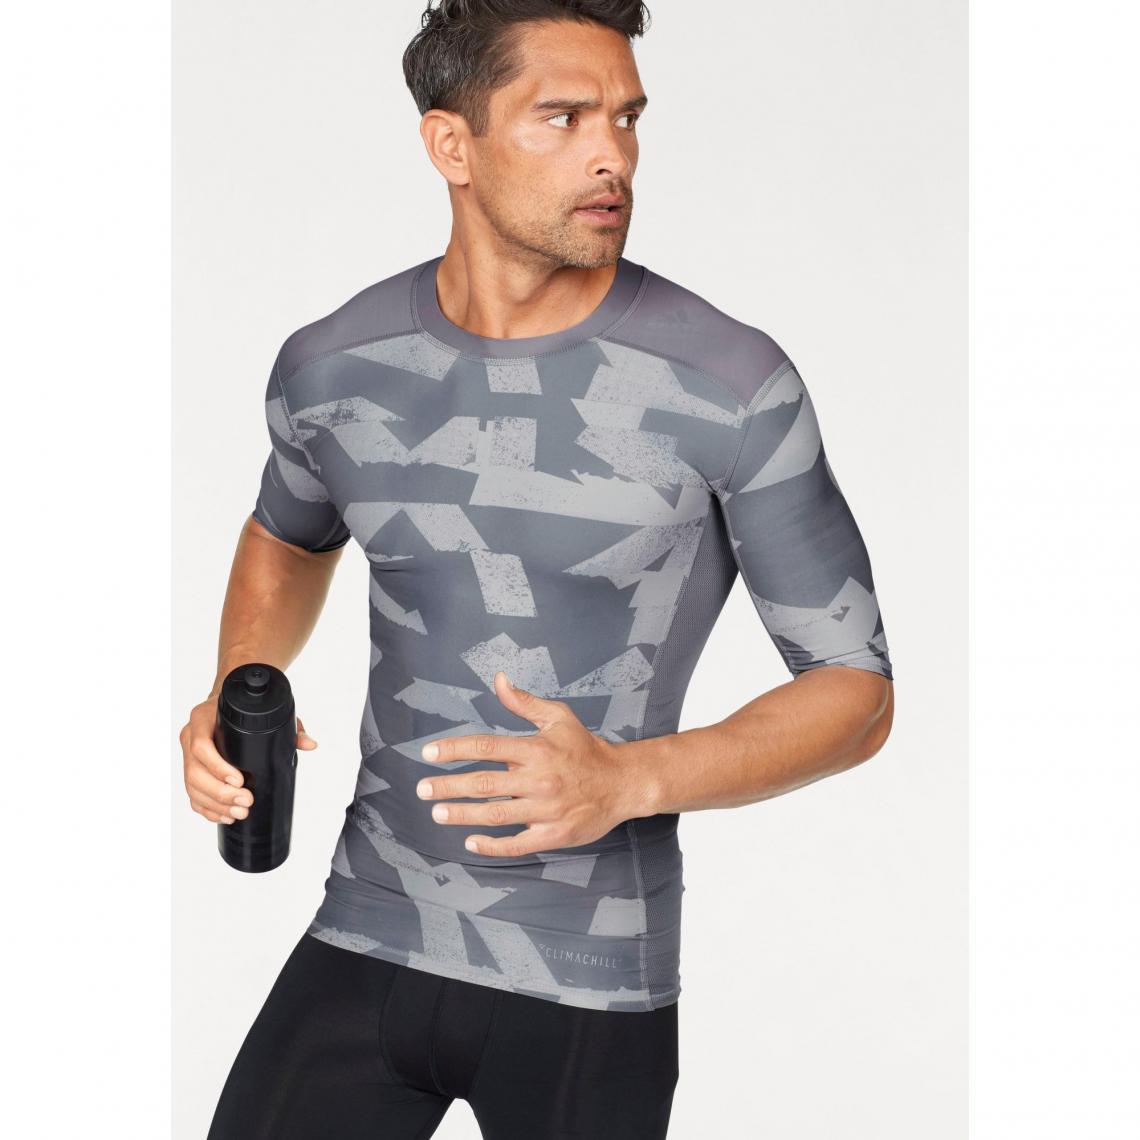 5025dda63ca T-shirt manches coudes adidas Performance Techfit Climalite® pour homme -  Gris Adidas Performance